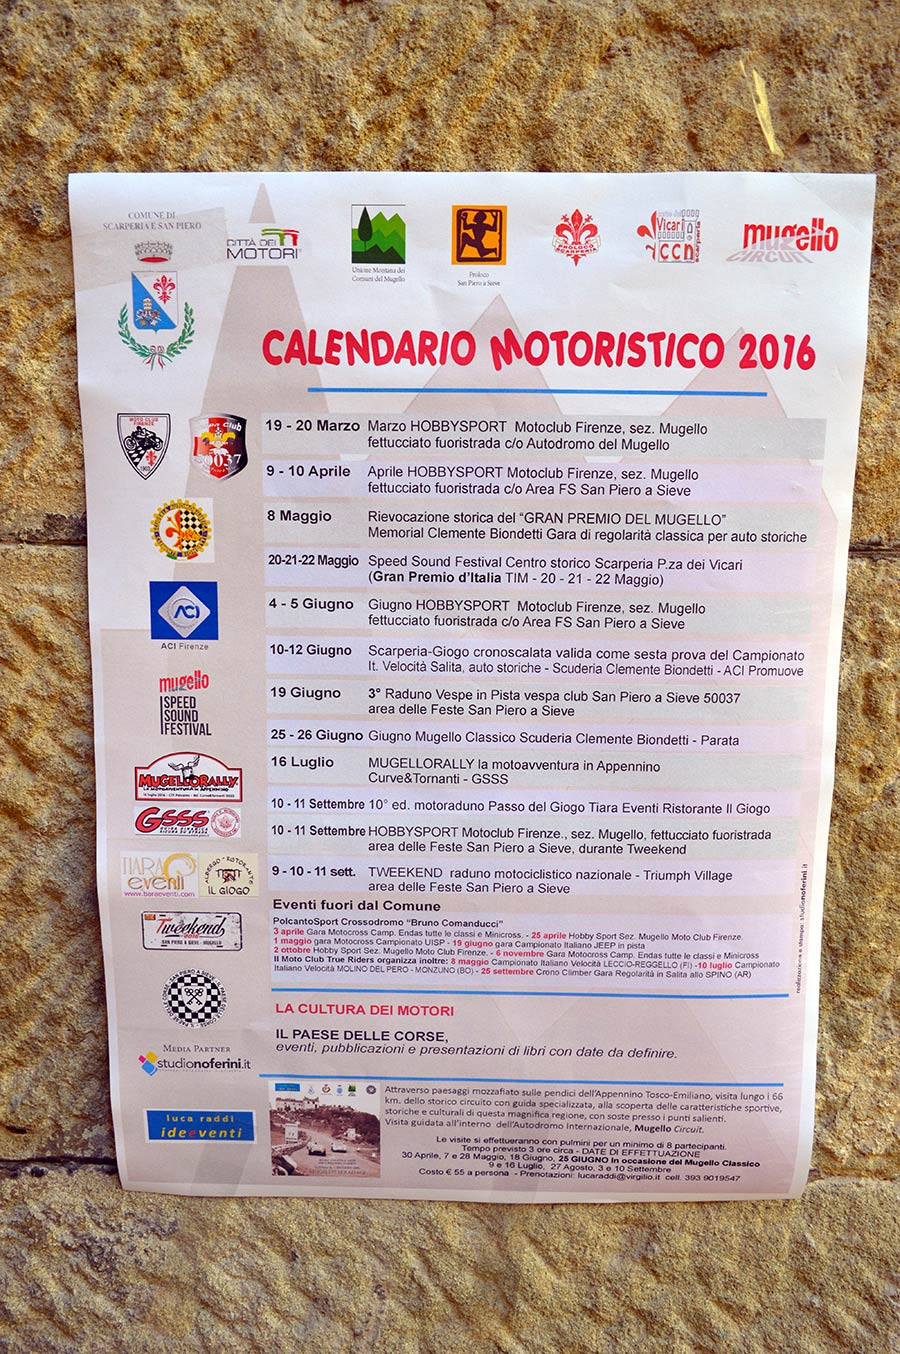 calendario-motoristico-2016-2